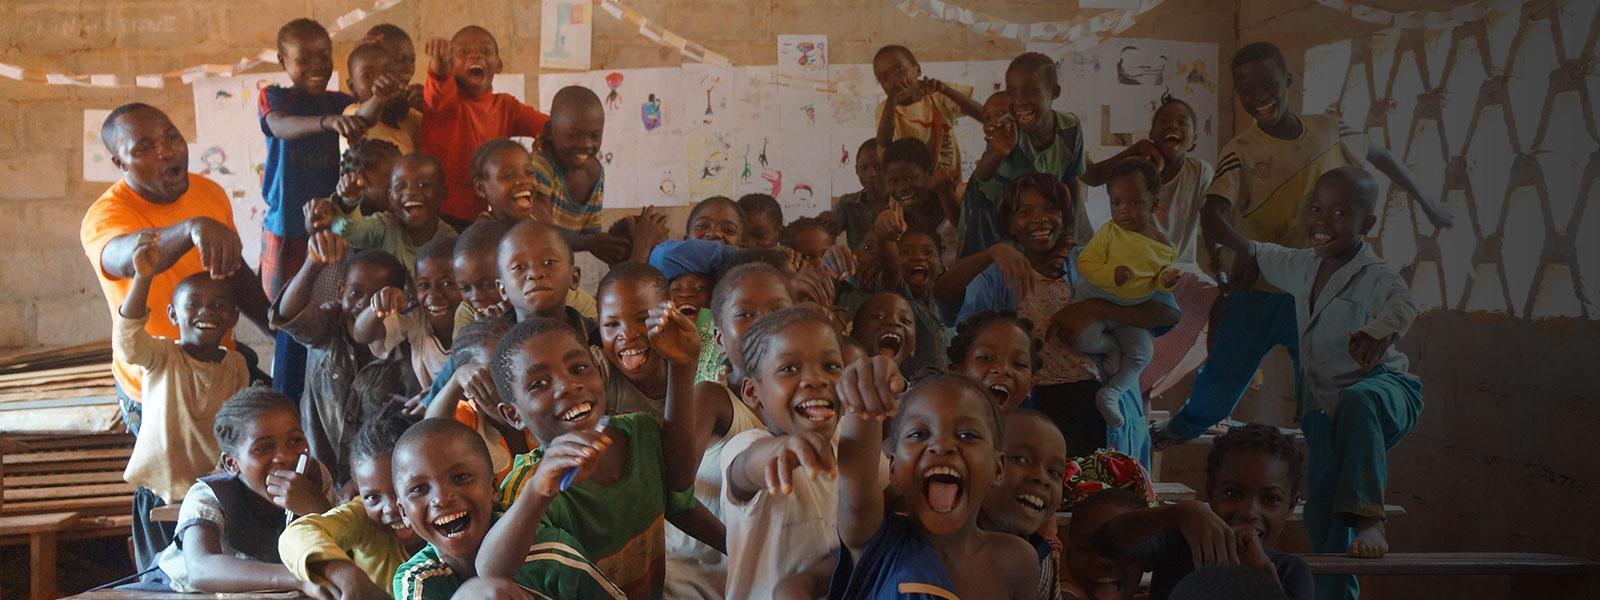 Kids in Cameroon, Africa